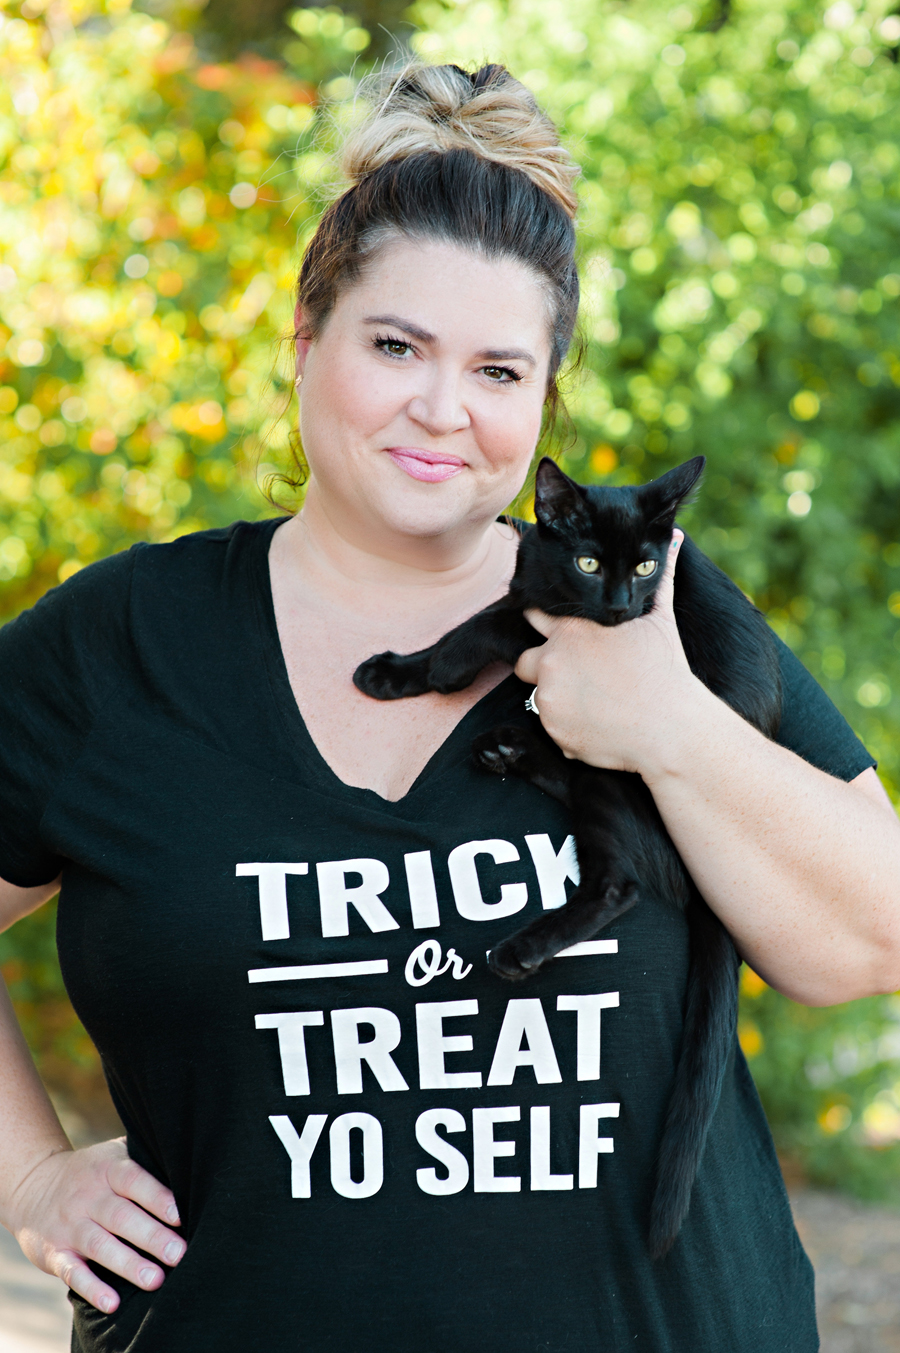 Trick or Treat Yo Self Halloween Shirt